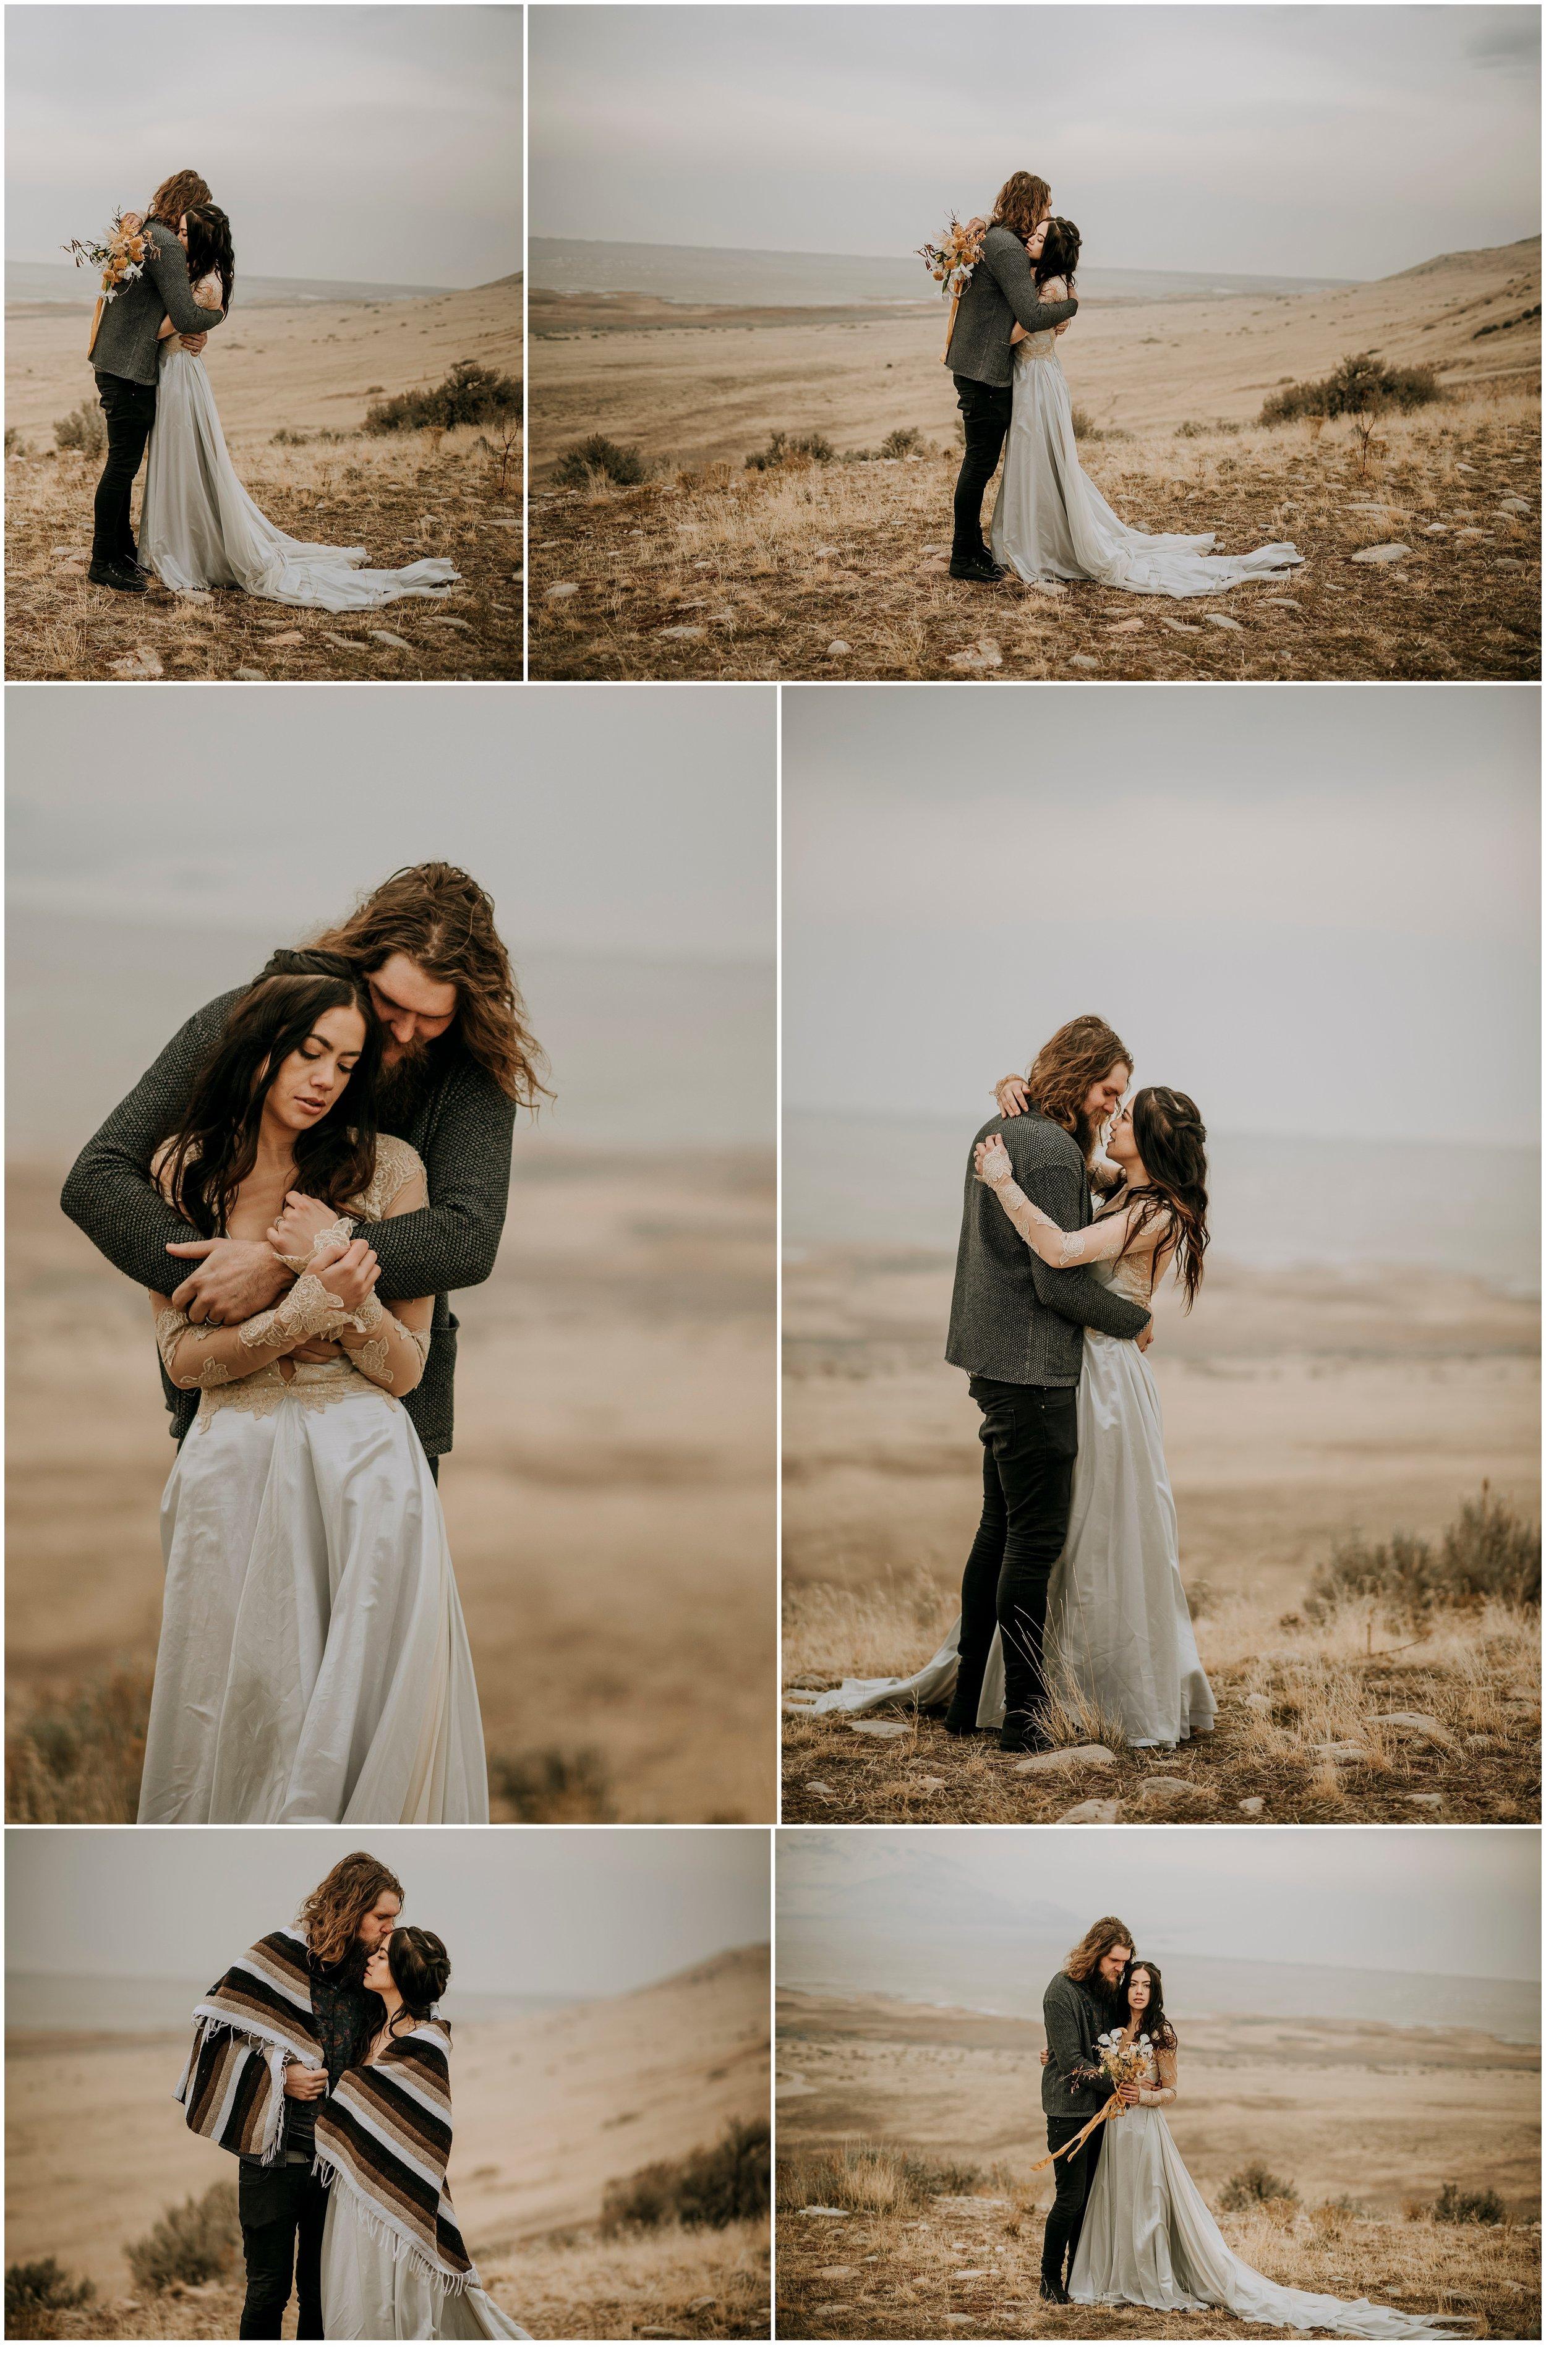 breelle_hilsenrath_photography_moab_utah_wedding_photographer.jpg